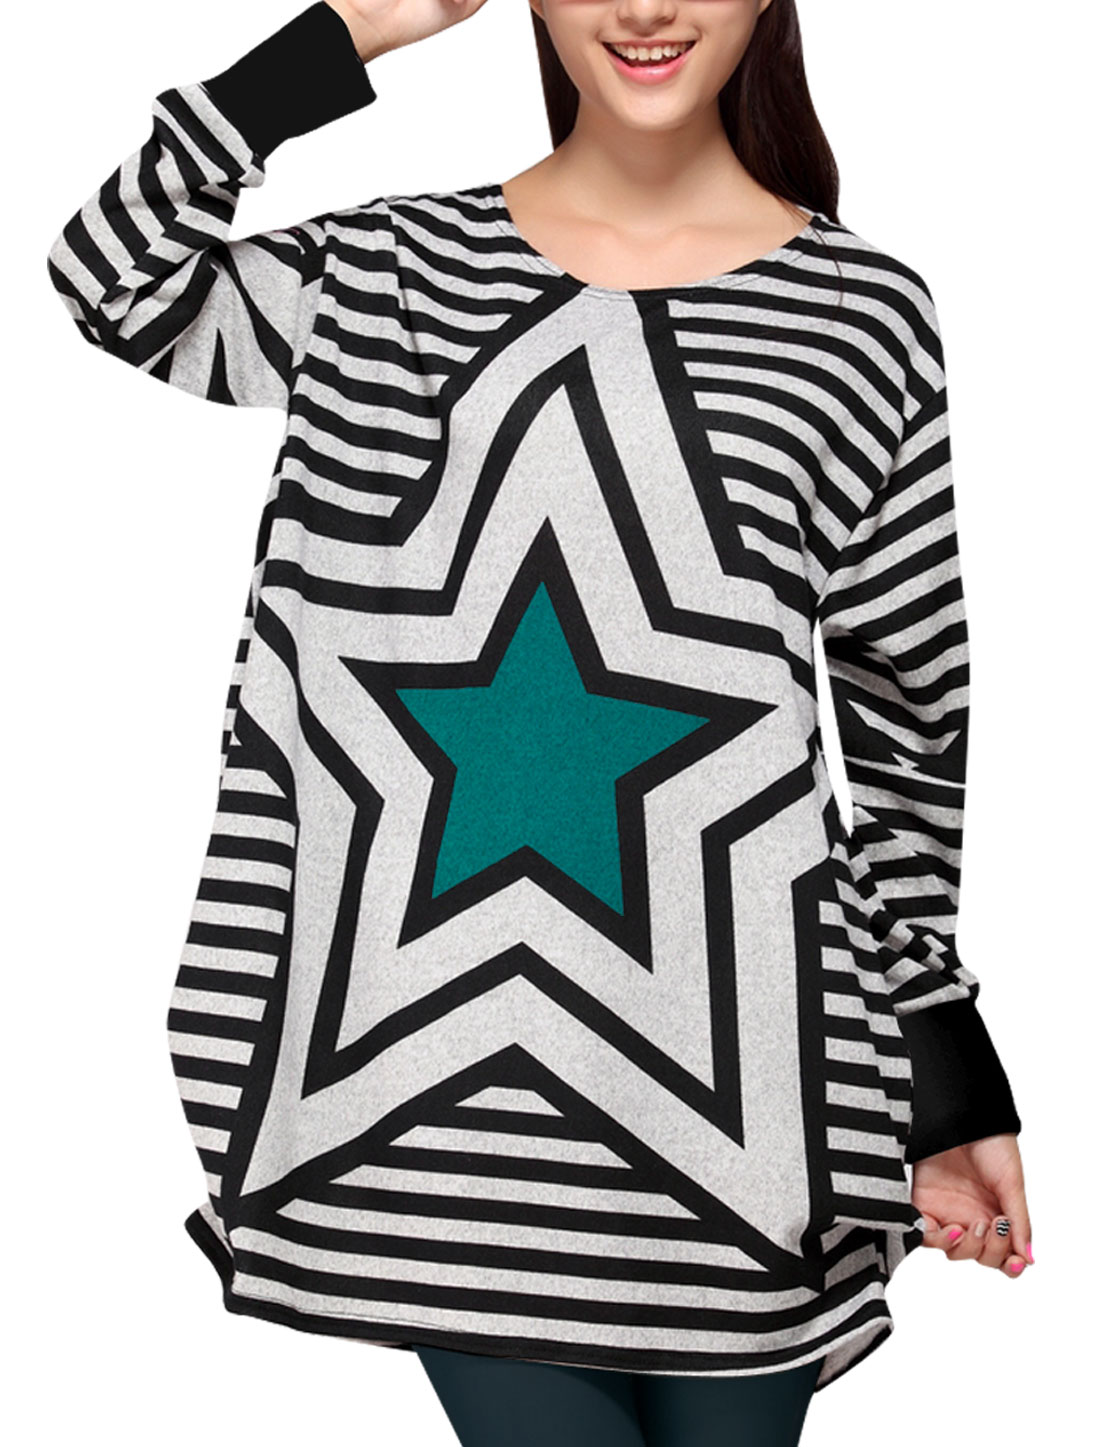 Lady's Leisure Long Blue Stars Pattern Tee M